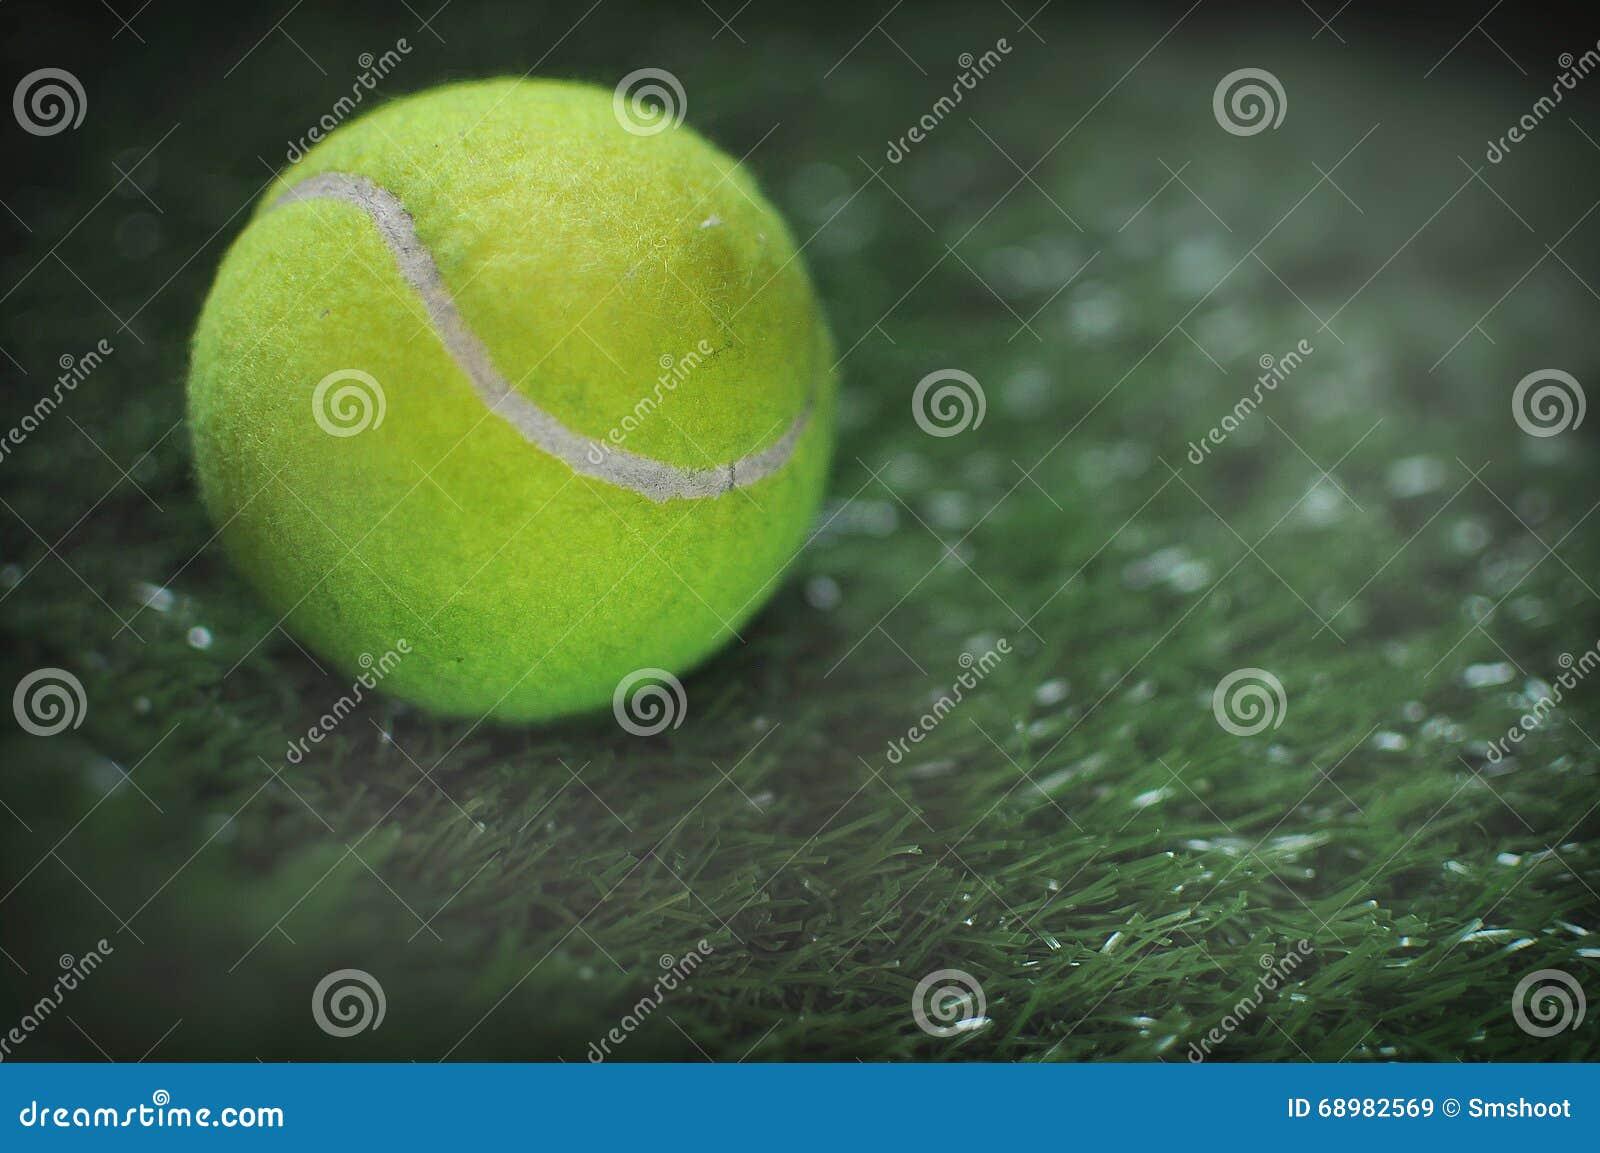 Pelota de tenis en la hierba verde